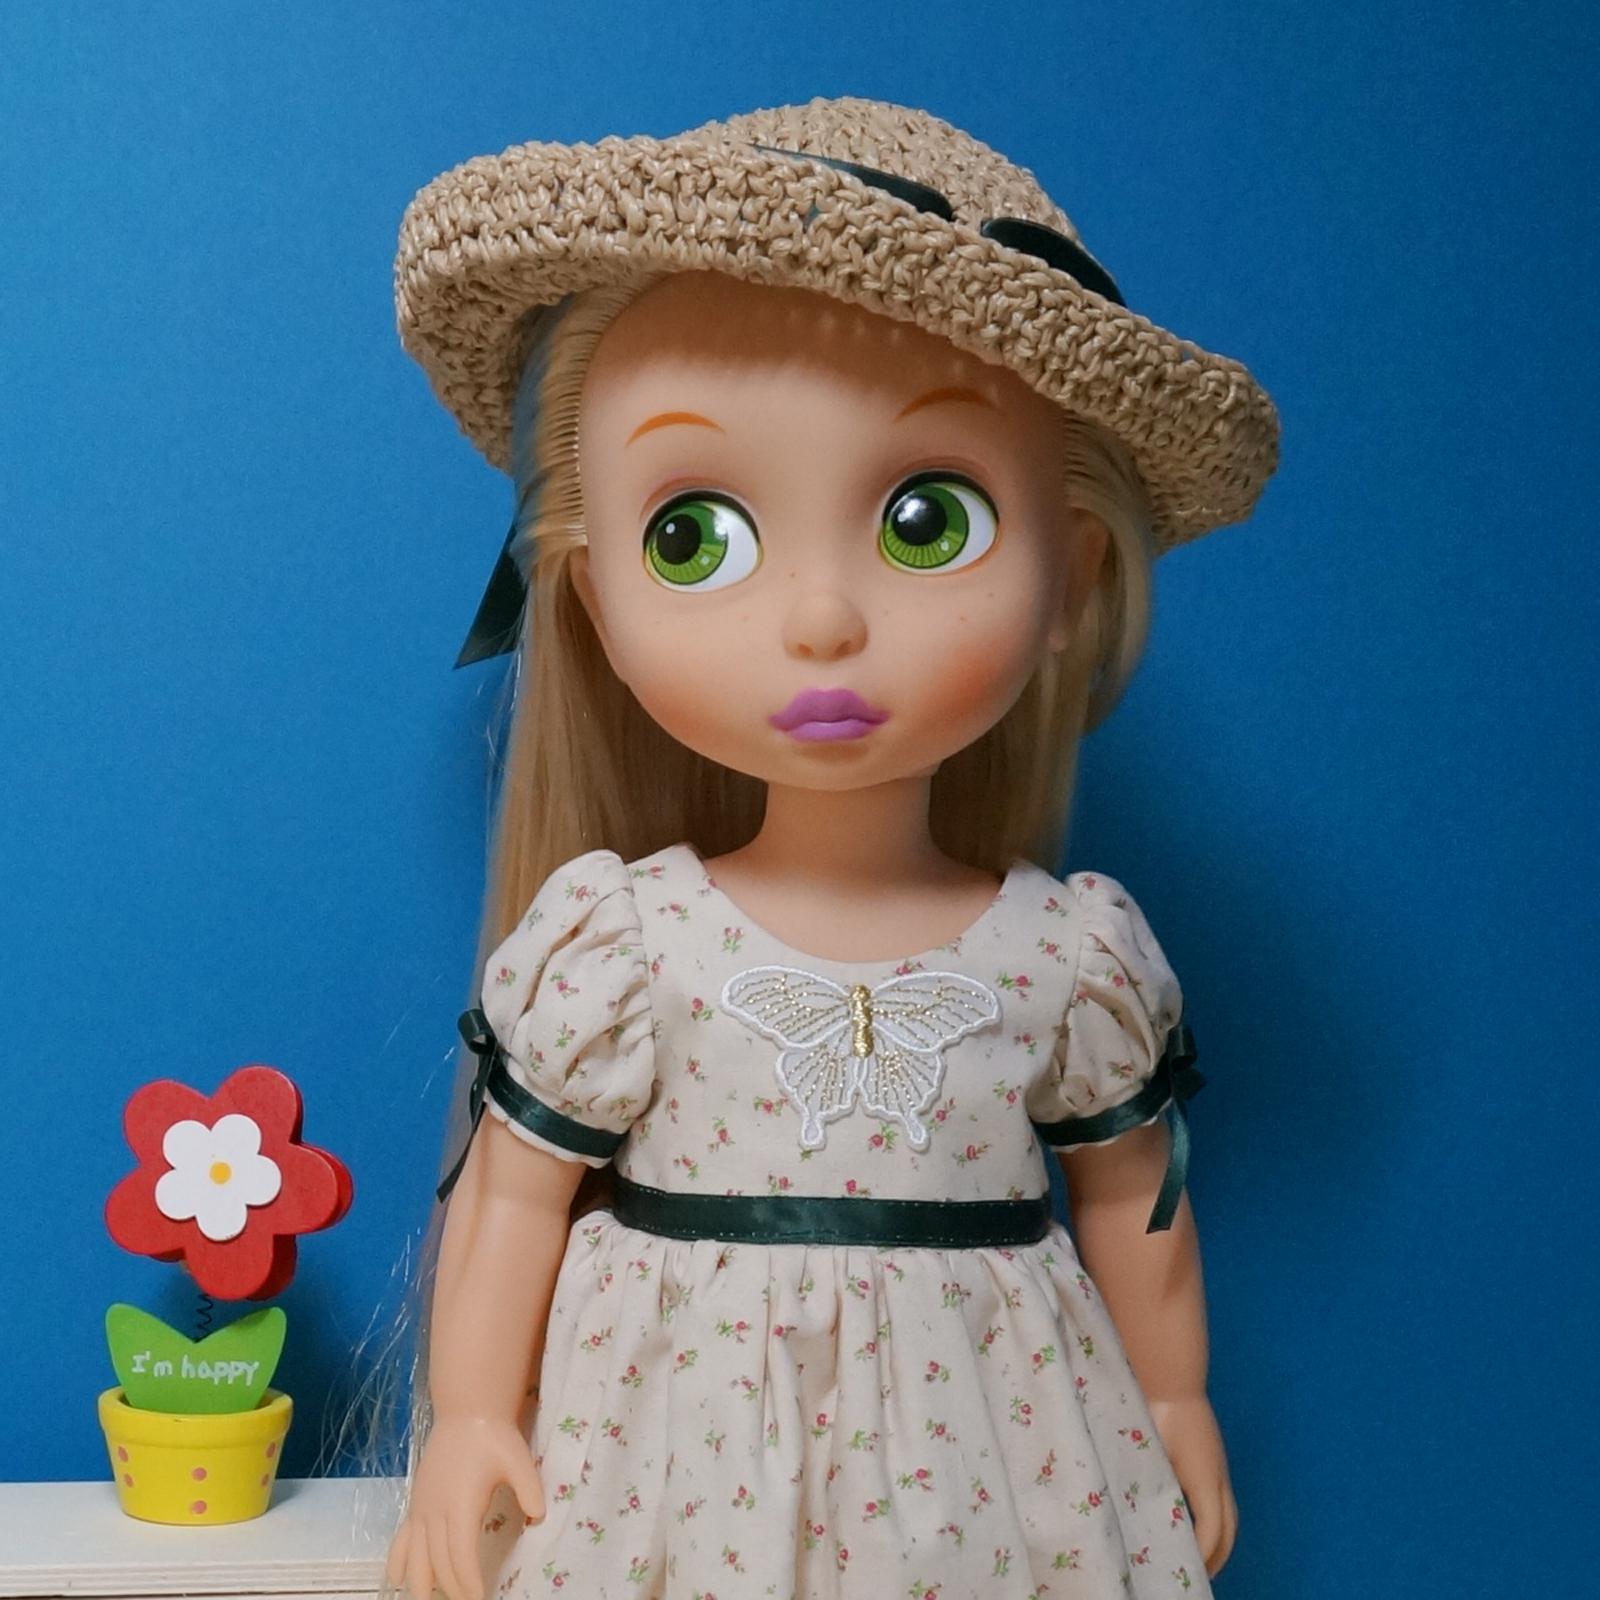 Disney Princess Doll Clothes: Disney Baby Doll Hat Clothes Clothing Scarett Animator's